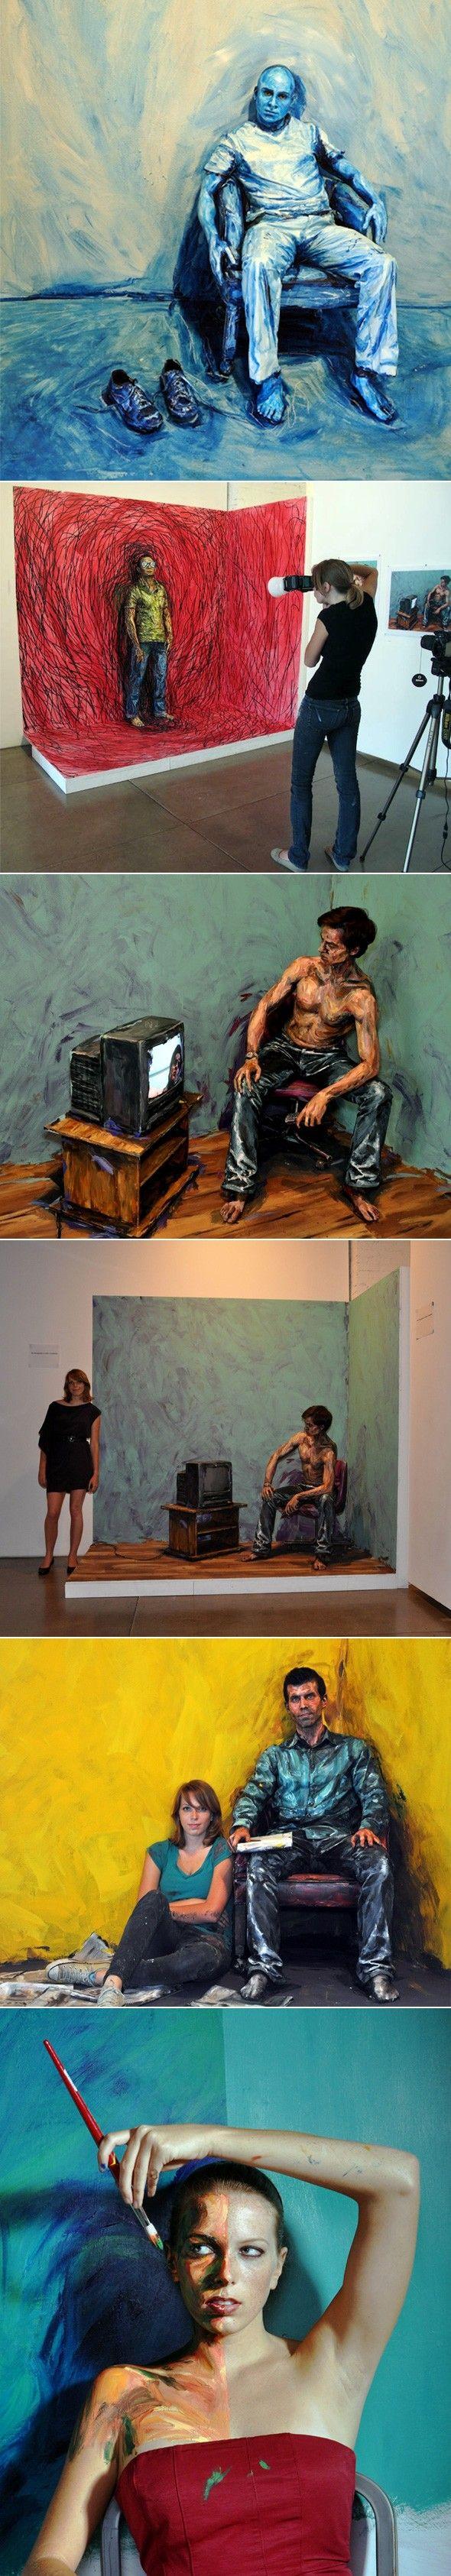 ART >>> Incroyable body-painting par Alexa Meade